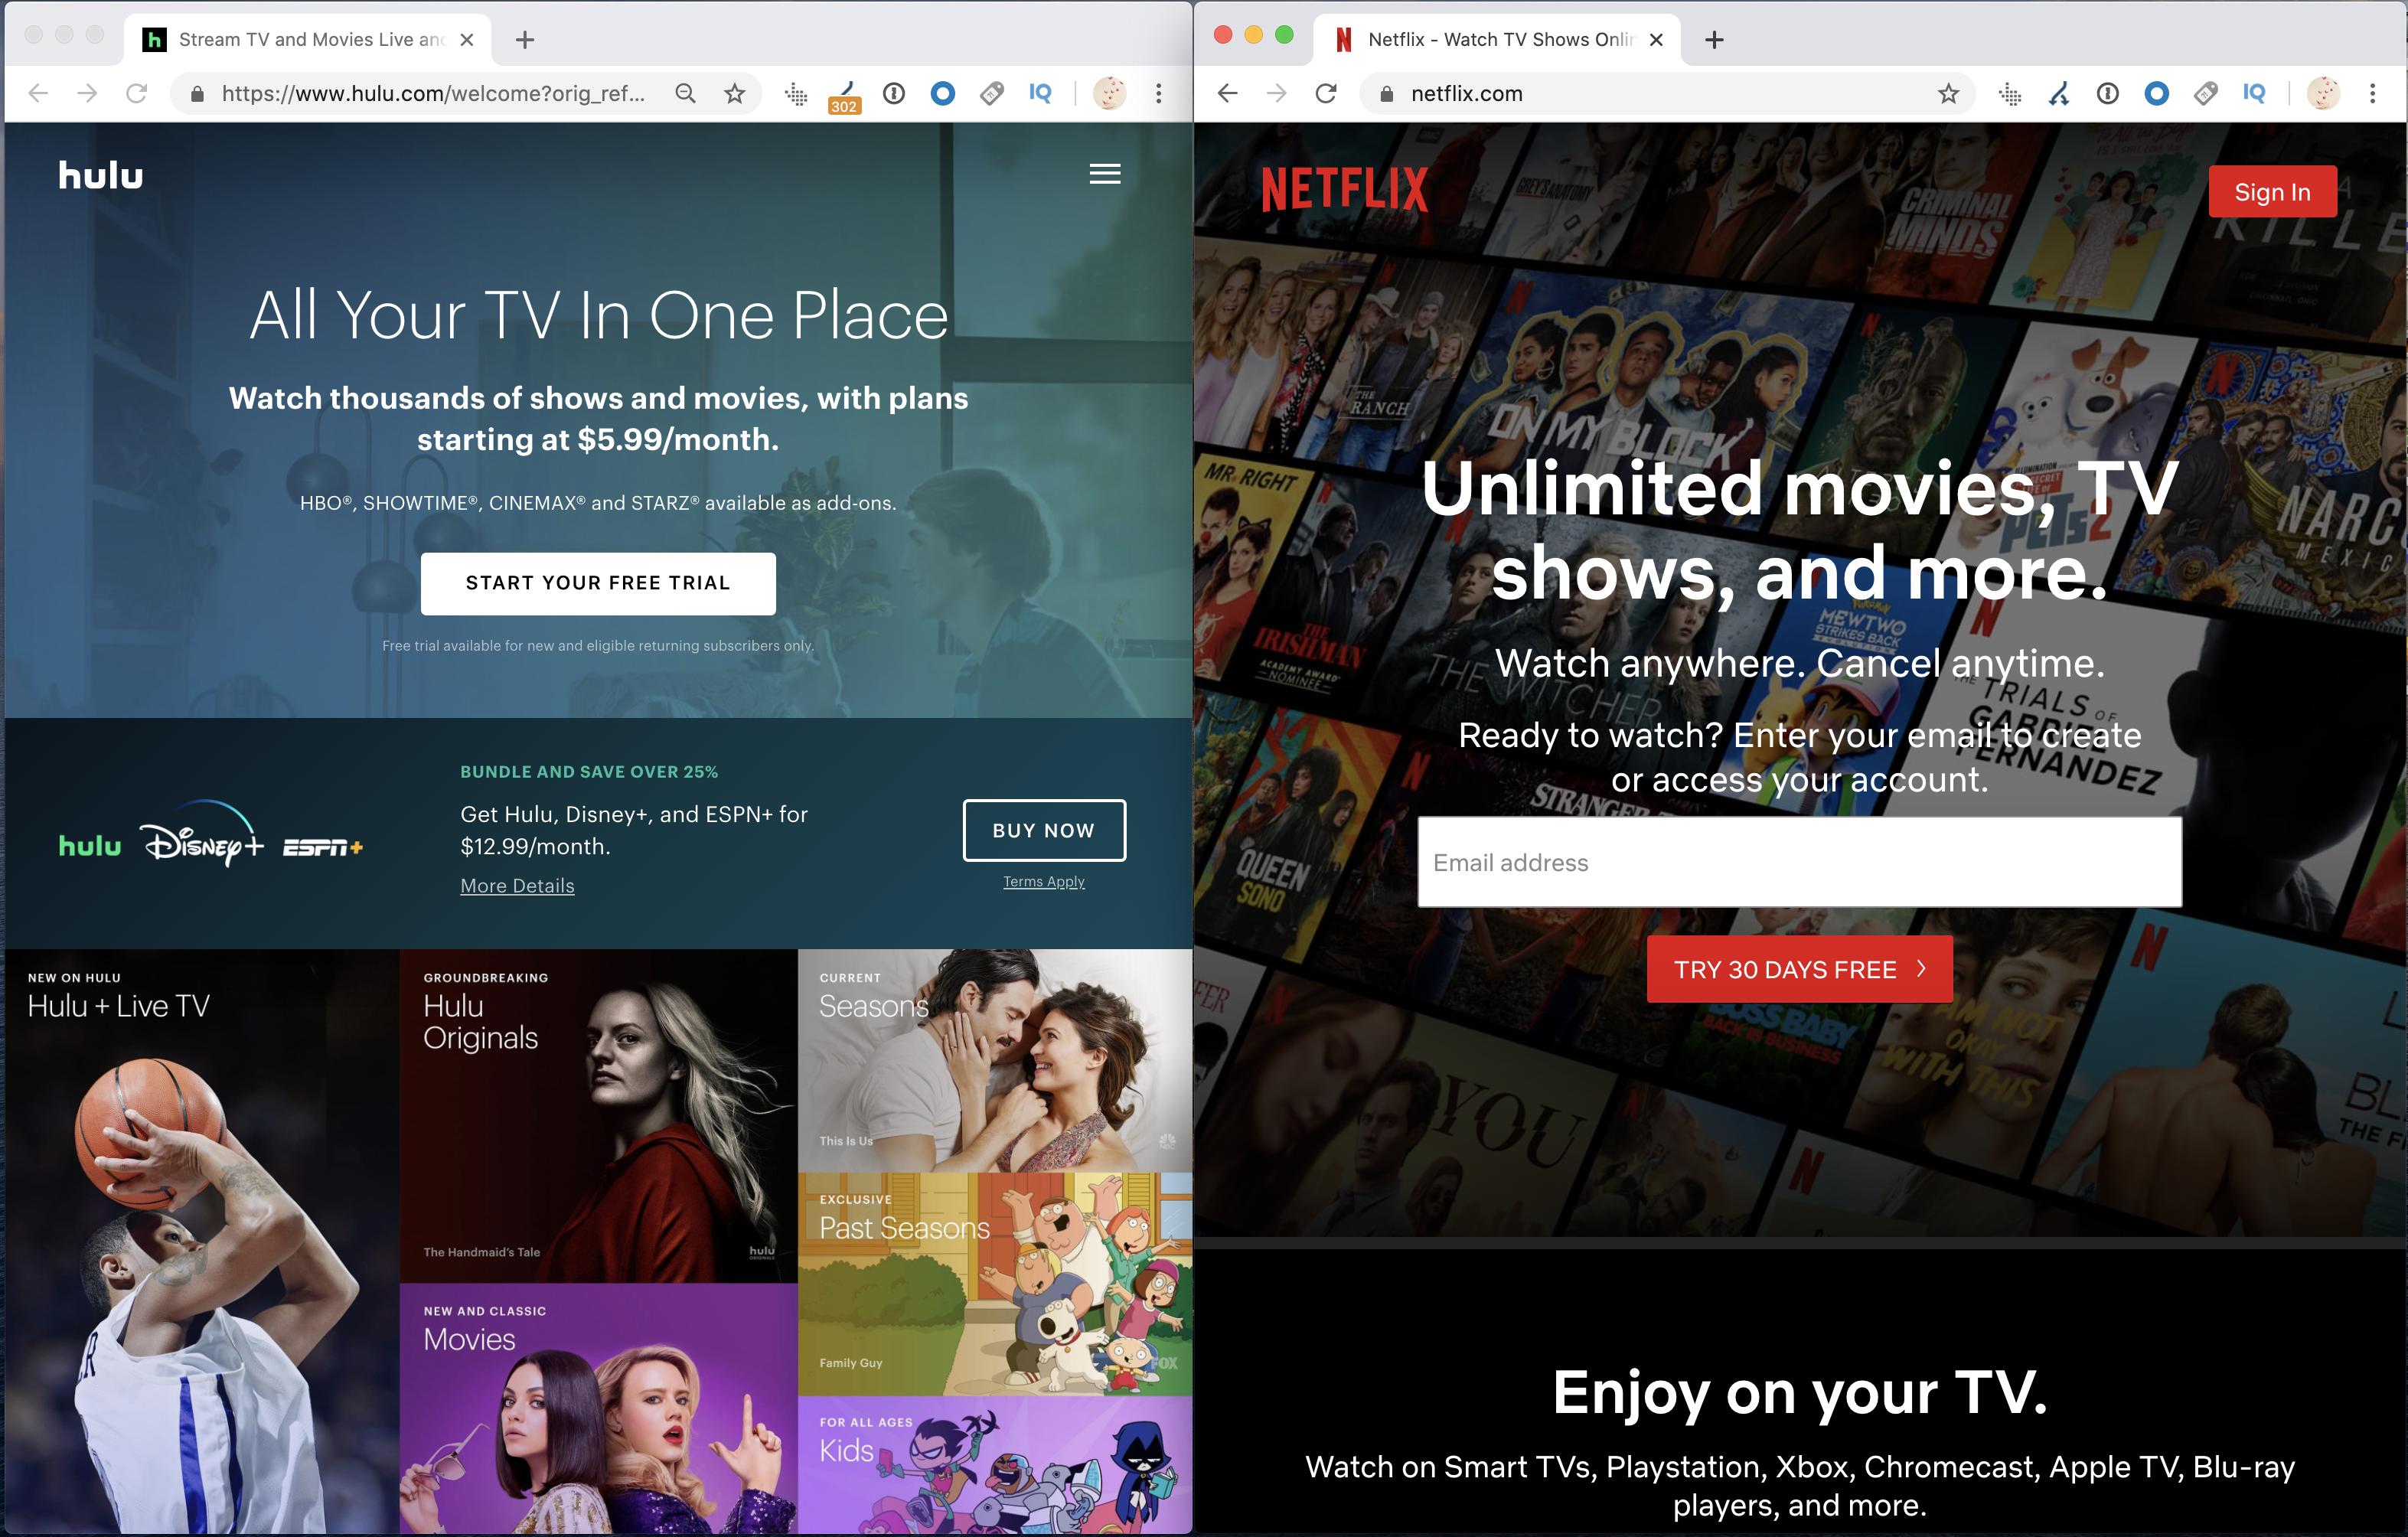 Hulu VS Netflix websites